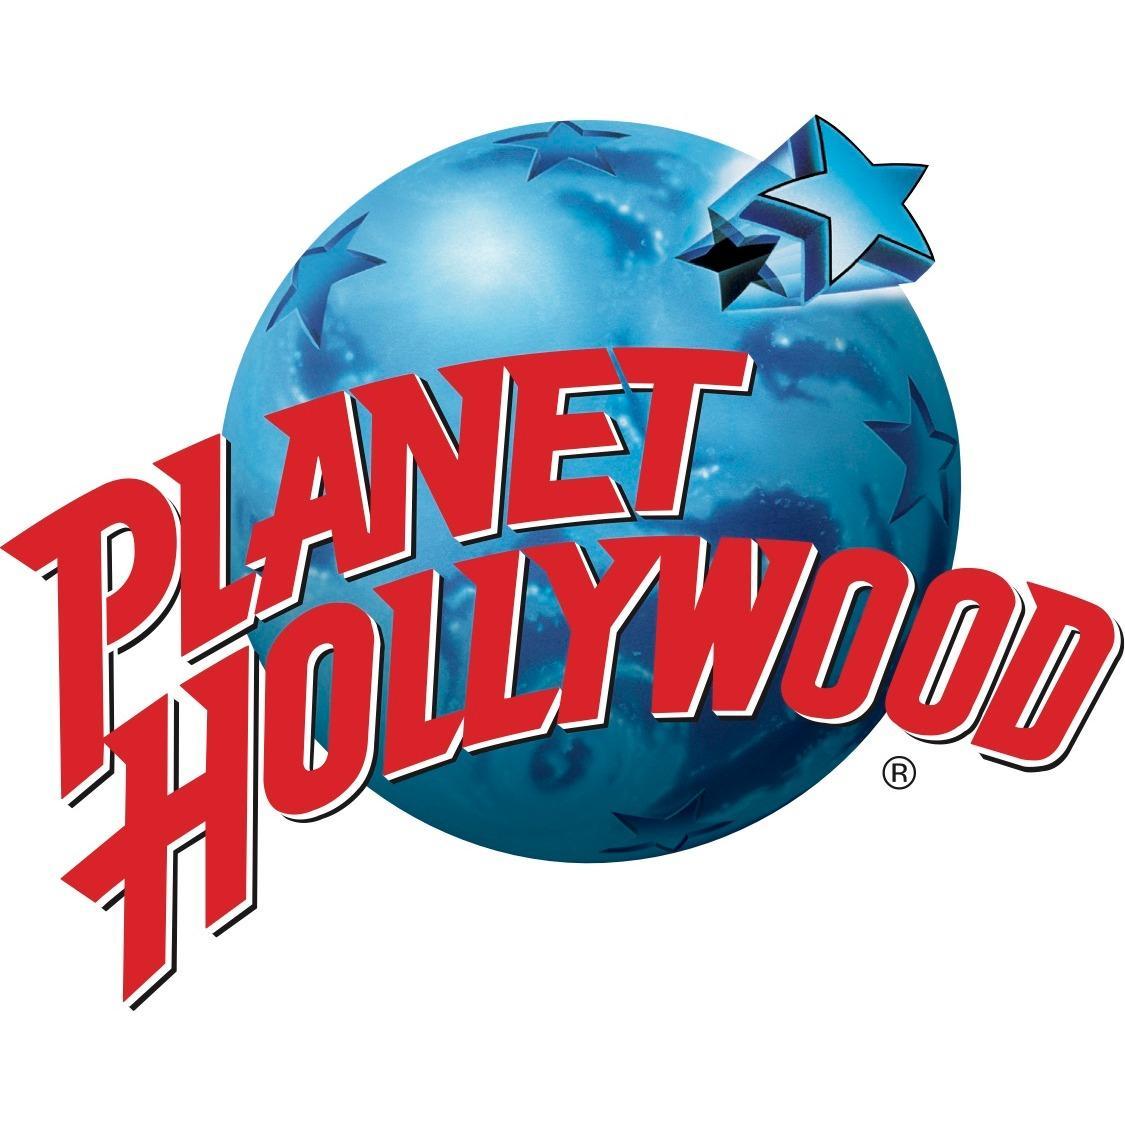 Planet Hollywood - London, London SW1Y 4QX - 020 7287 1000 | ShowMeLocal.com